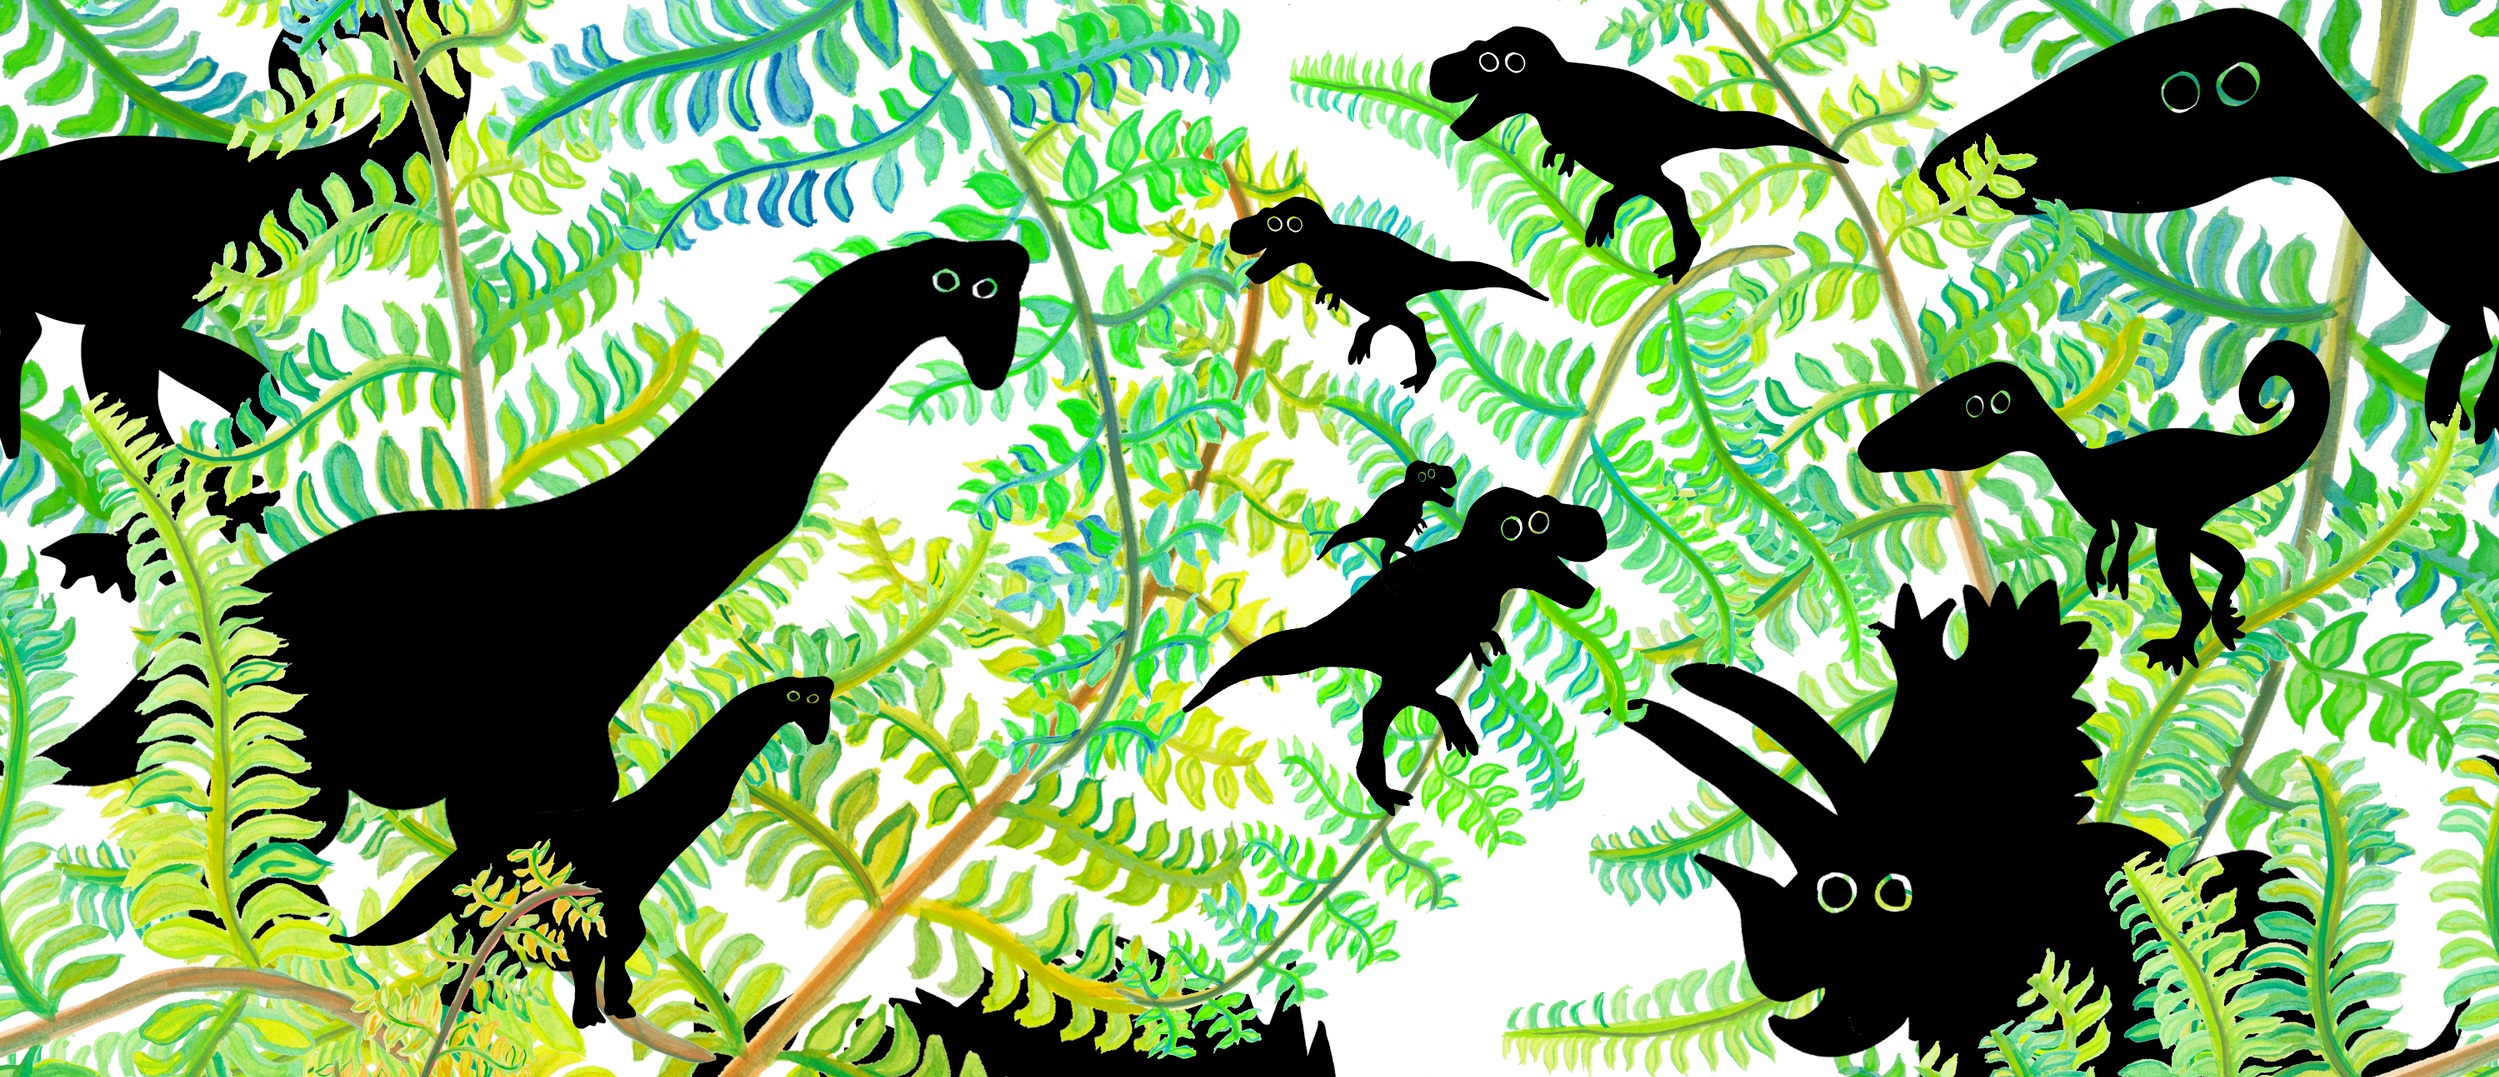 DinoPrintTRexBabies.jpg